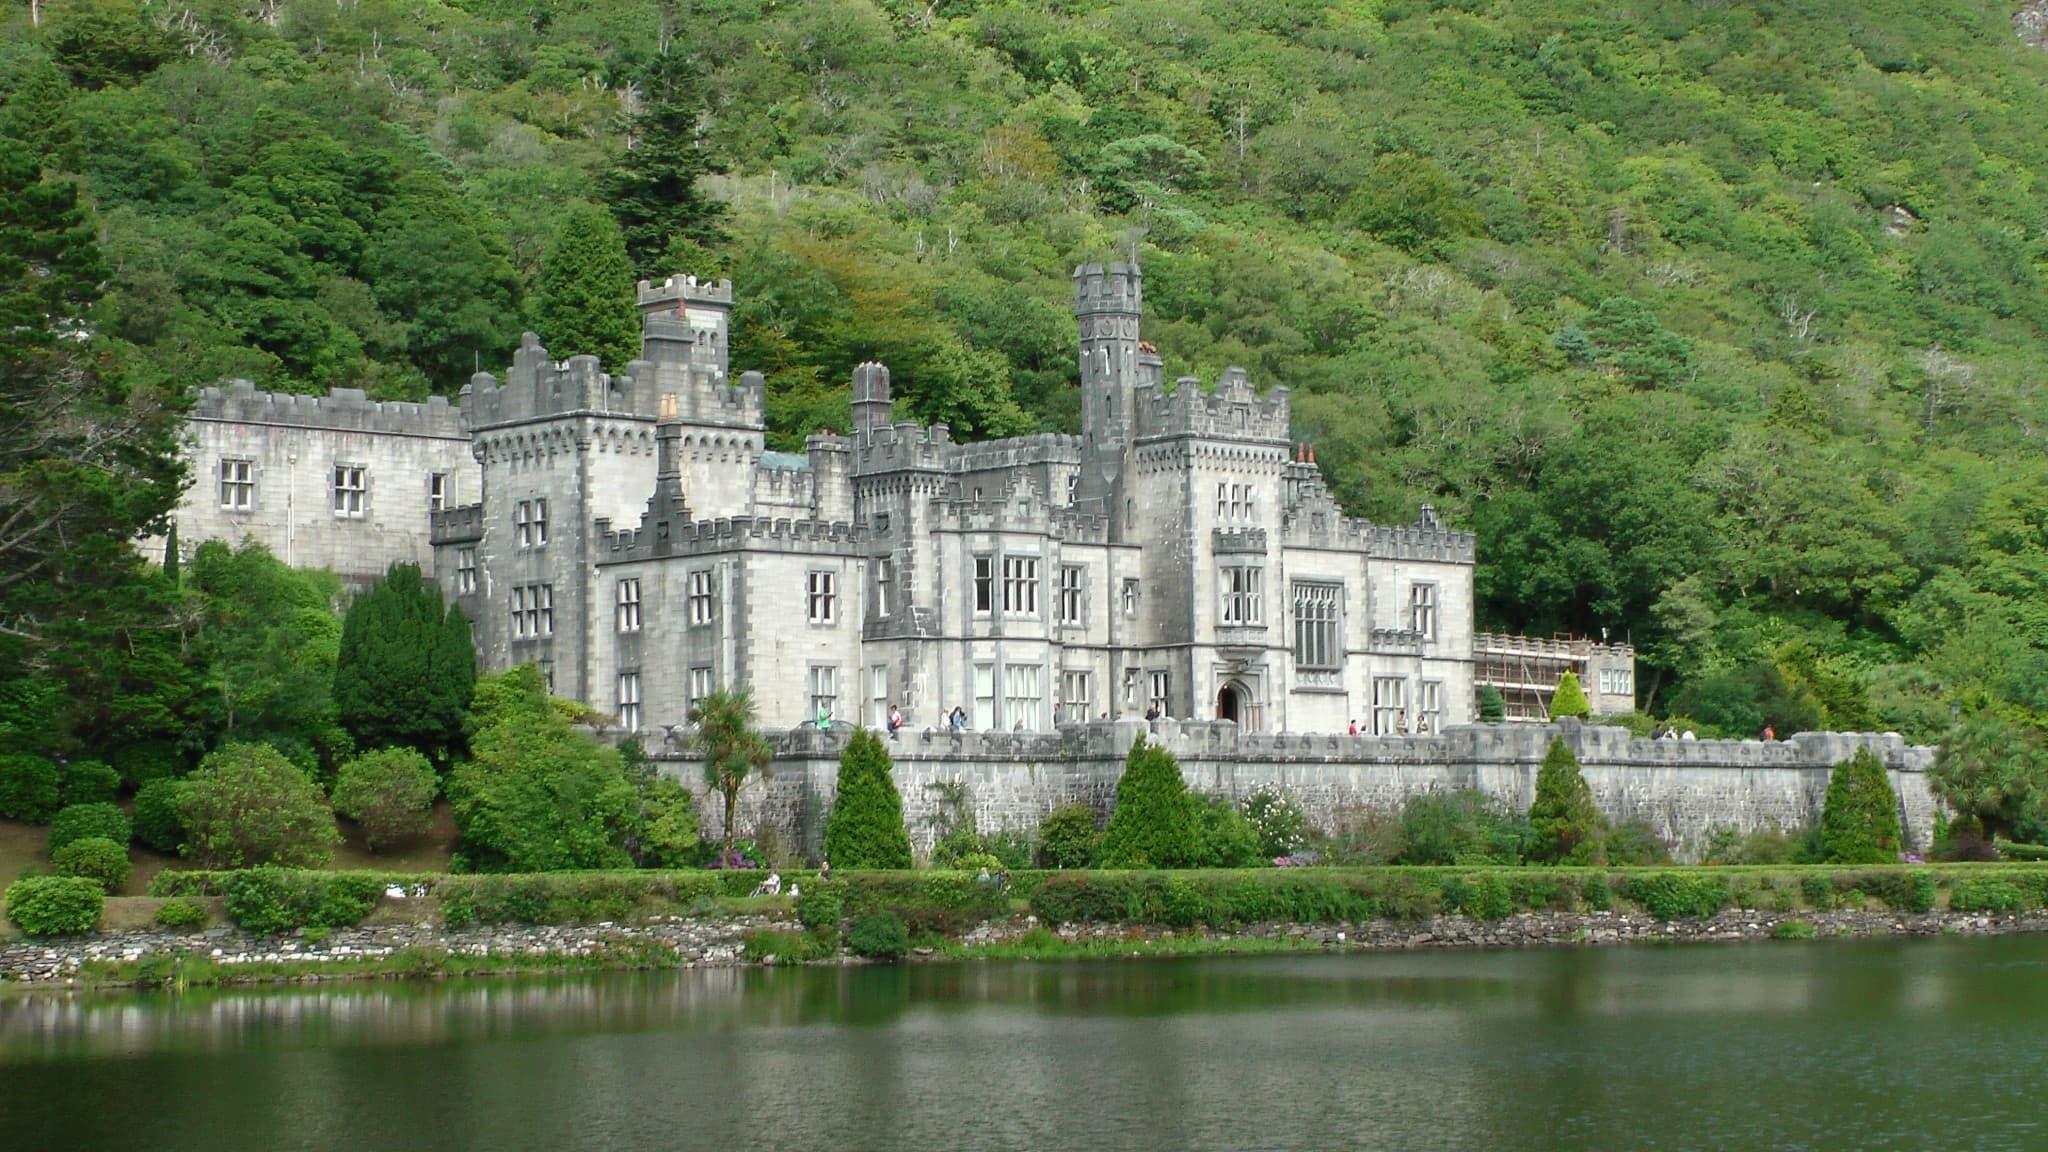 Ireland - Kylemore Abbey